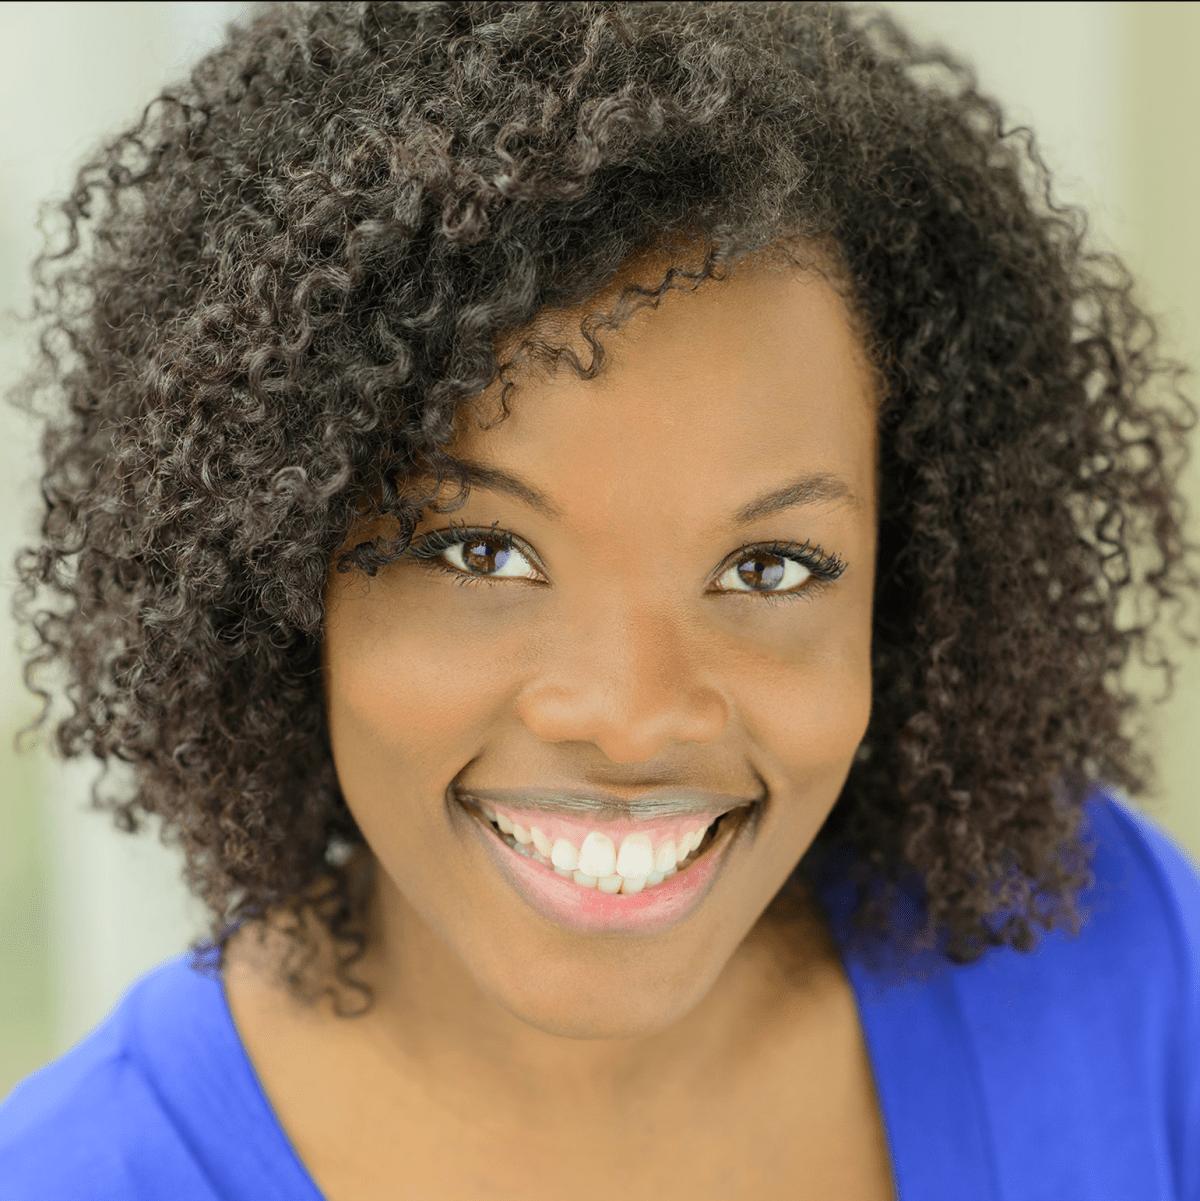 Dallas actress Sky Williams